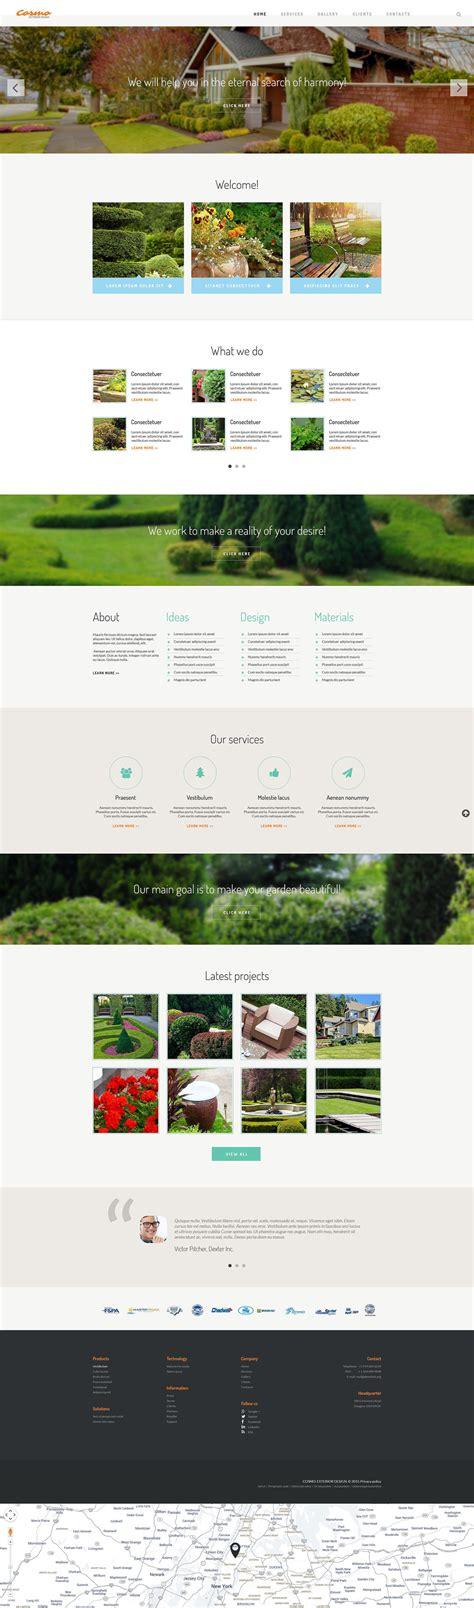 exterior design responsive website template 54566